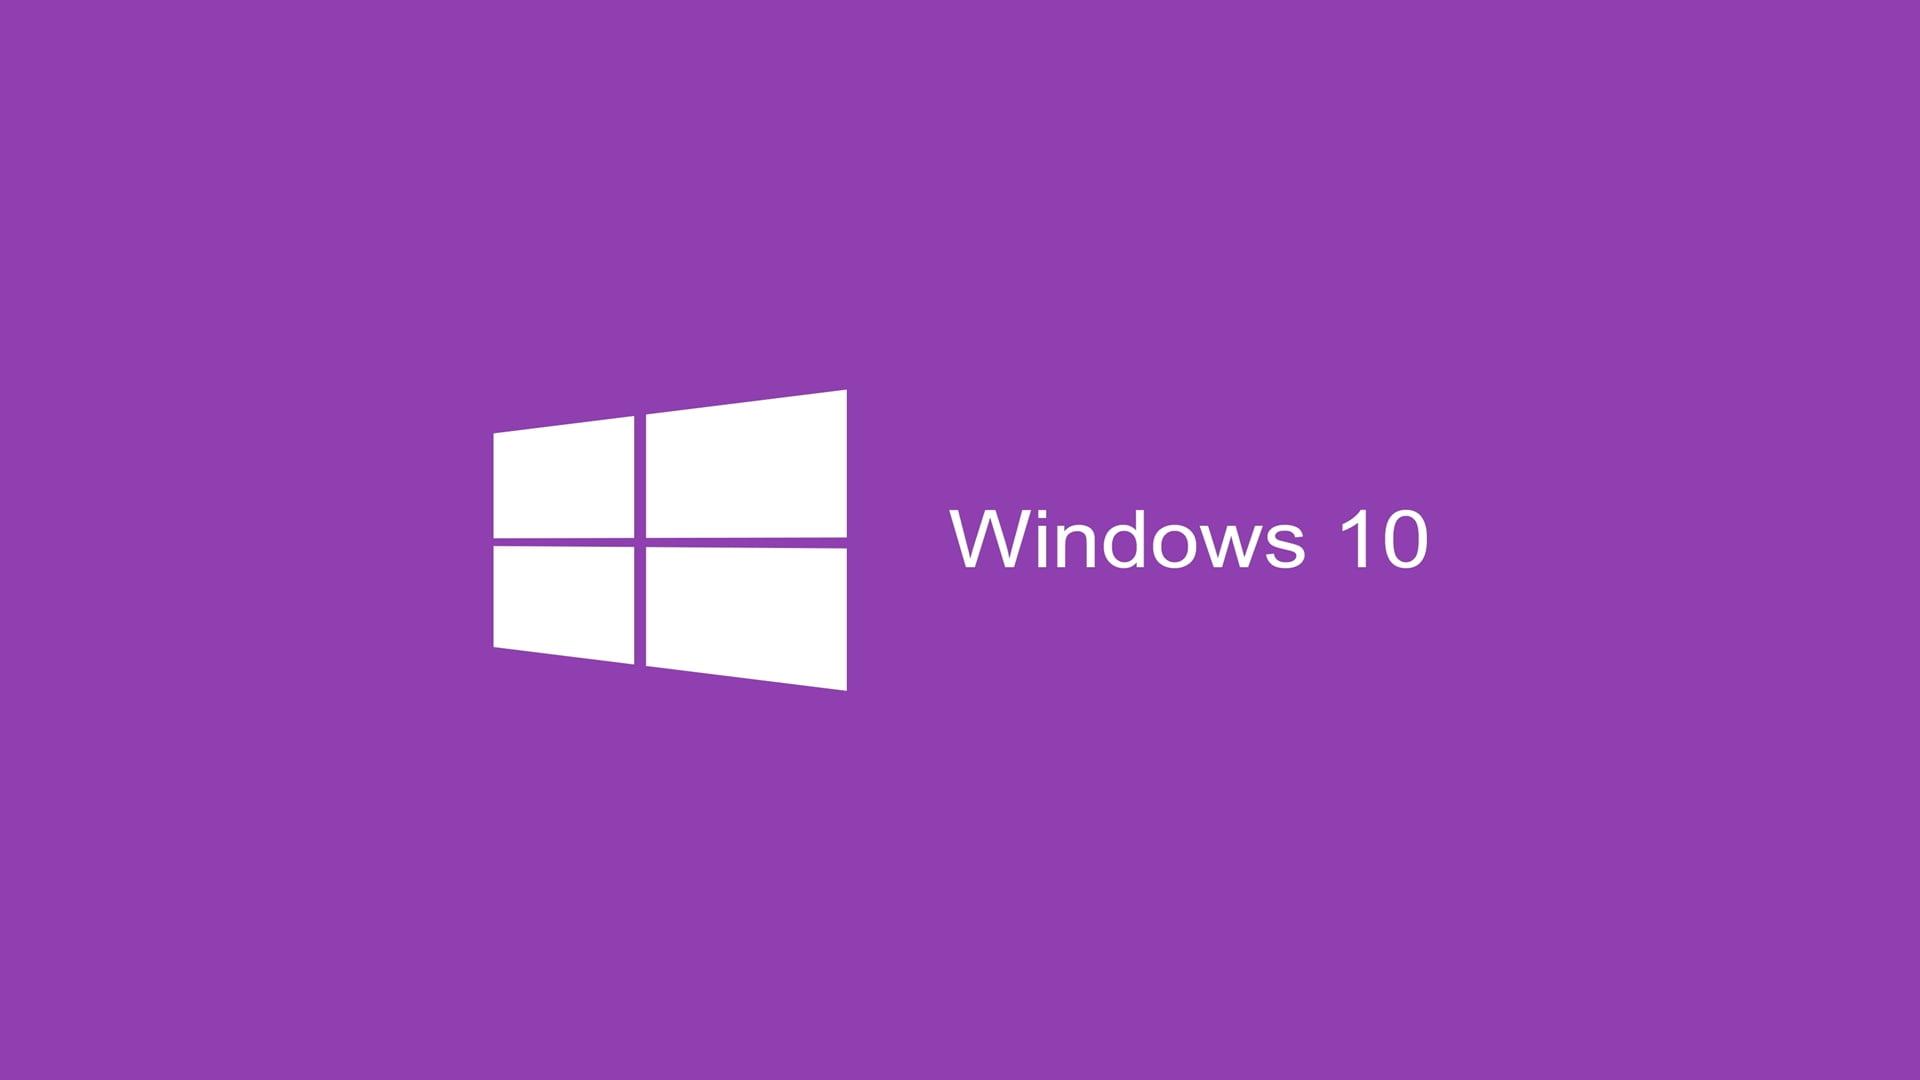 Papéis de parede do Windows 10 9